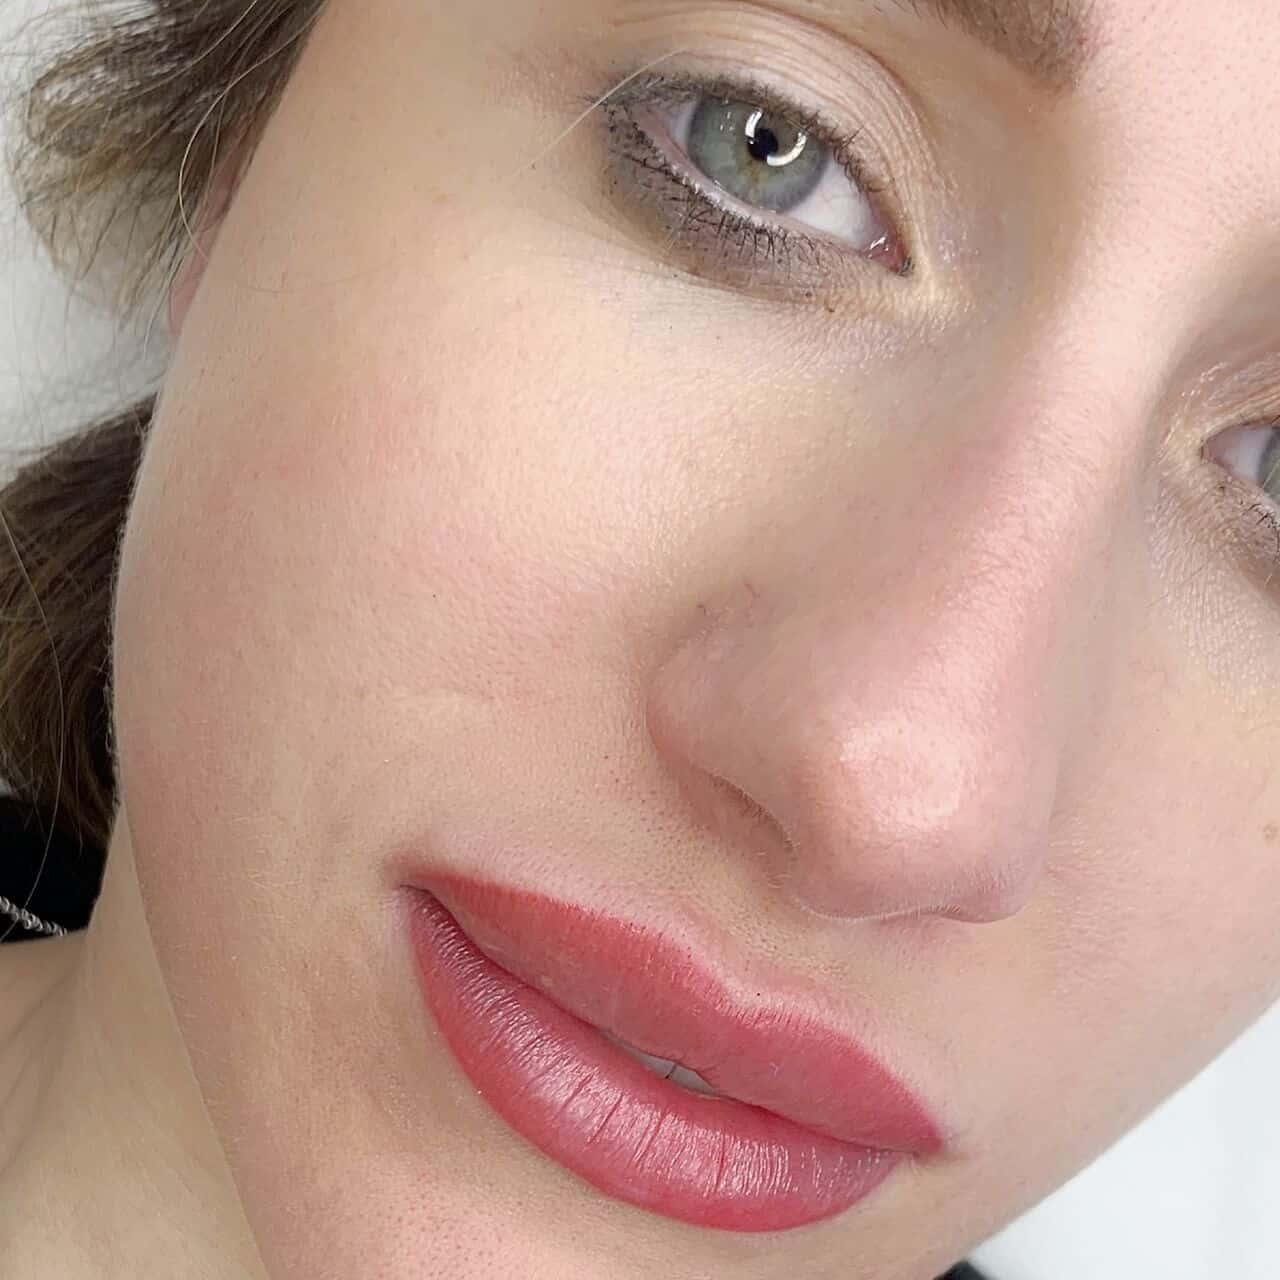 Tatuaggio Labbra Iconic Brows Manuela Maranto